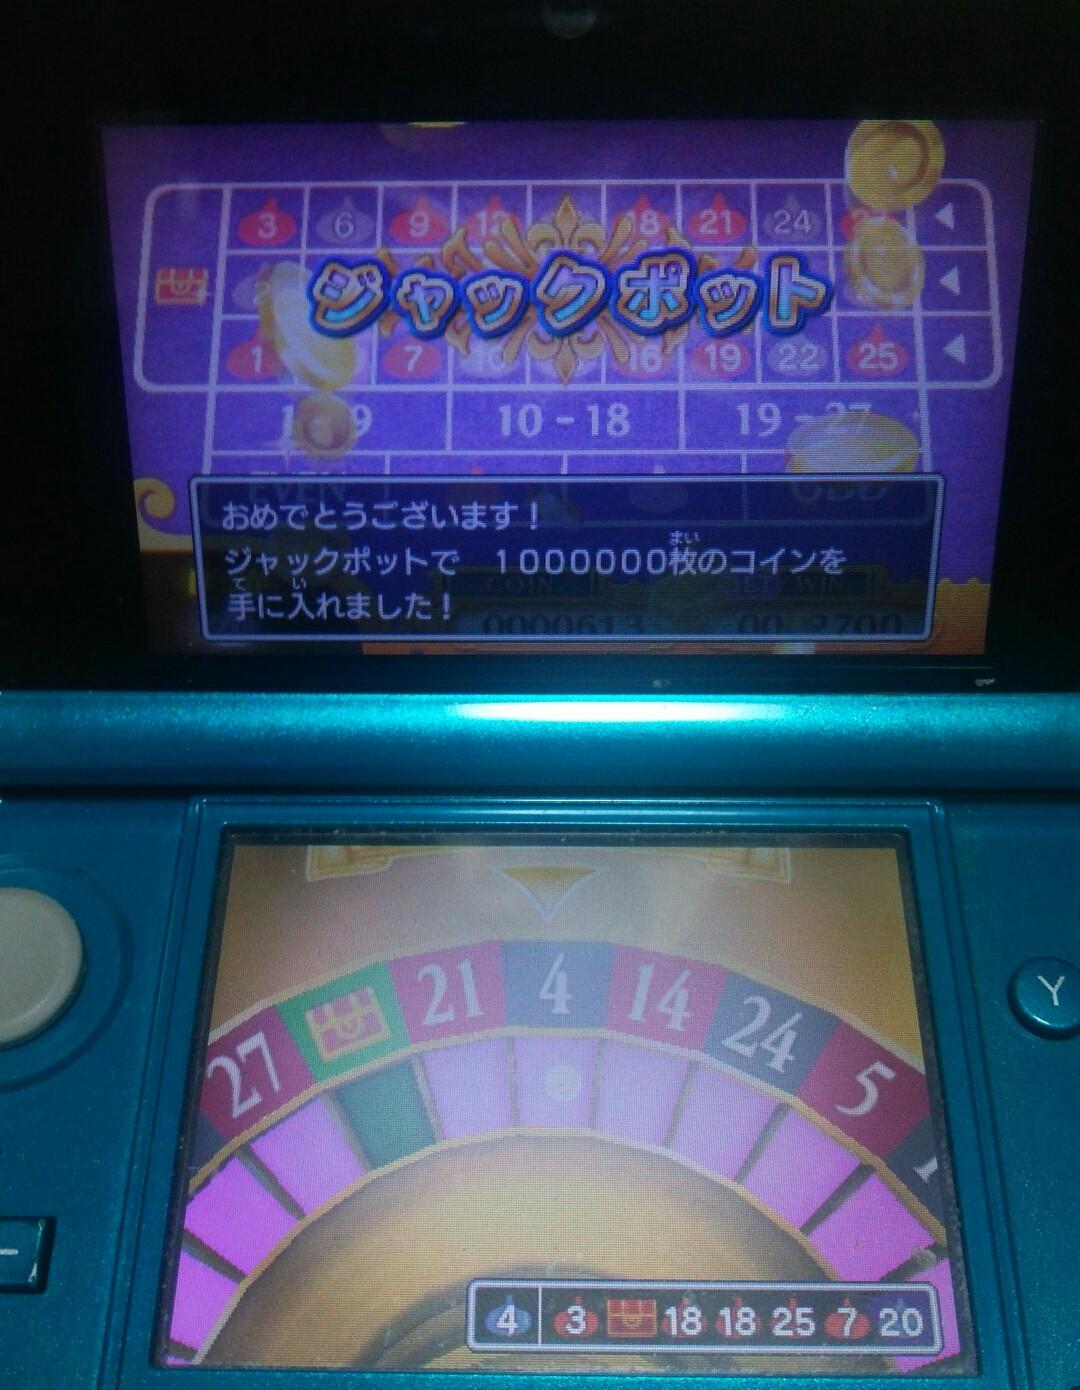 j2S0SOjZmANGv - 【PS4・3DS】ドラゴンクエストXI 過ぎ去りし時を求めて@狼 Part.4  8月17日